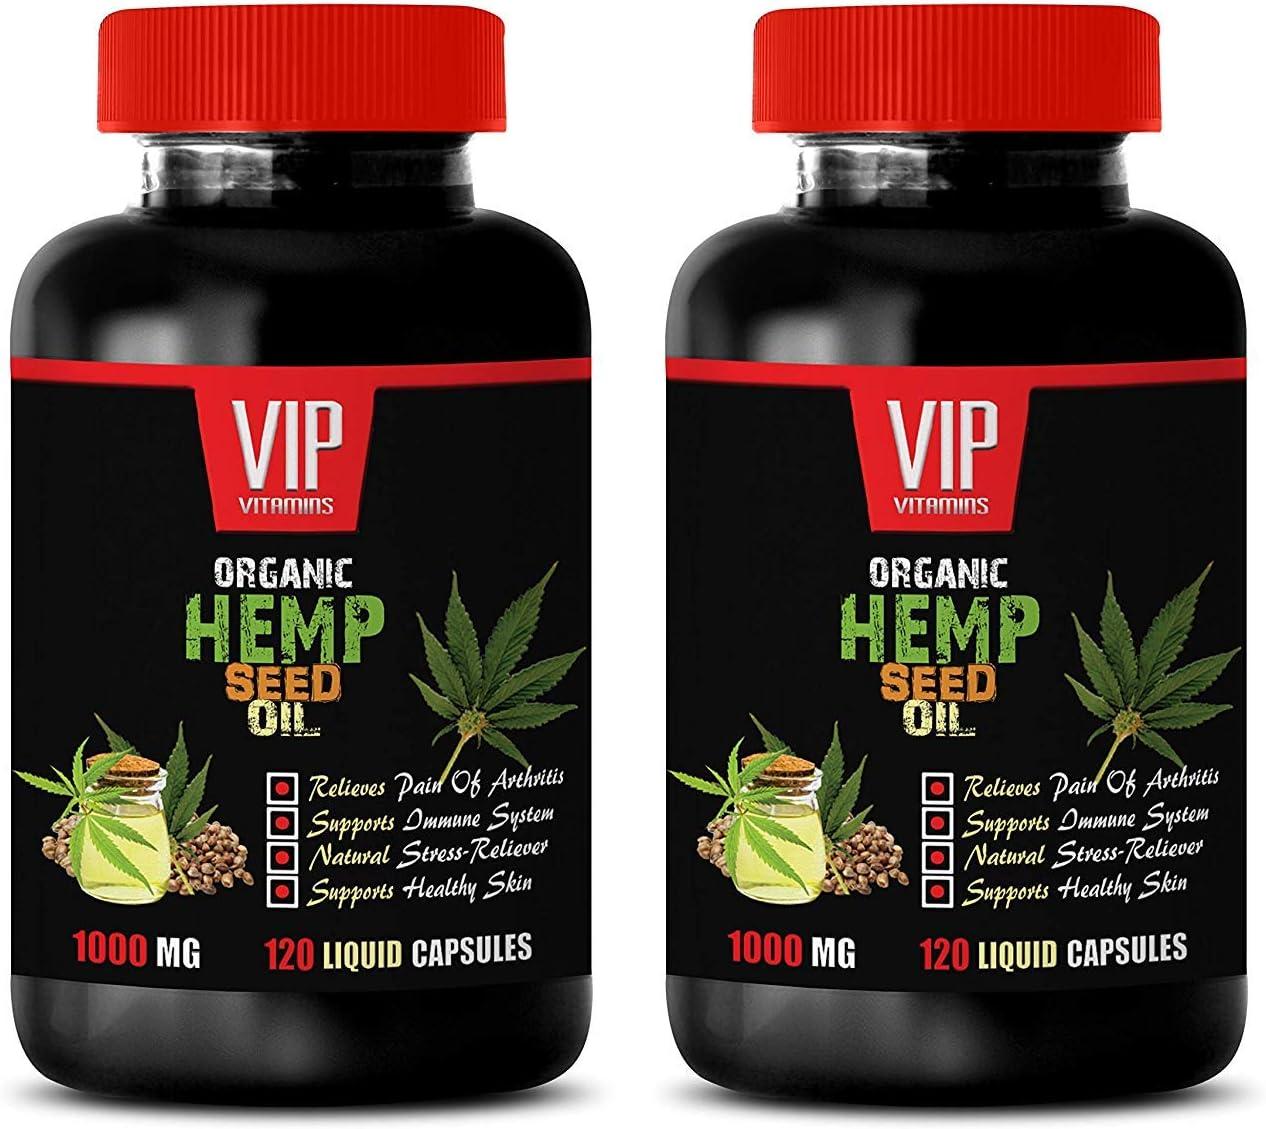 Anti inflammatory Herbal Supplement - Organic Hemp Seed Oil 1000MG - Pain Relief - Brain and Heart Health - Mood Boosting Supplements - 2 Bottle (240 Liquid Caps)